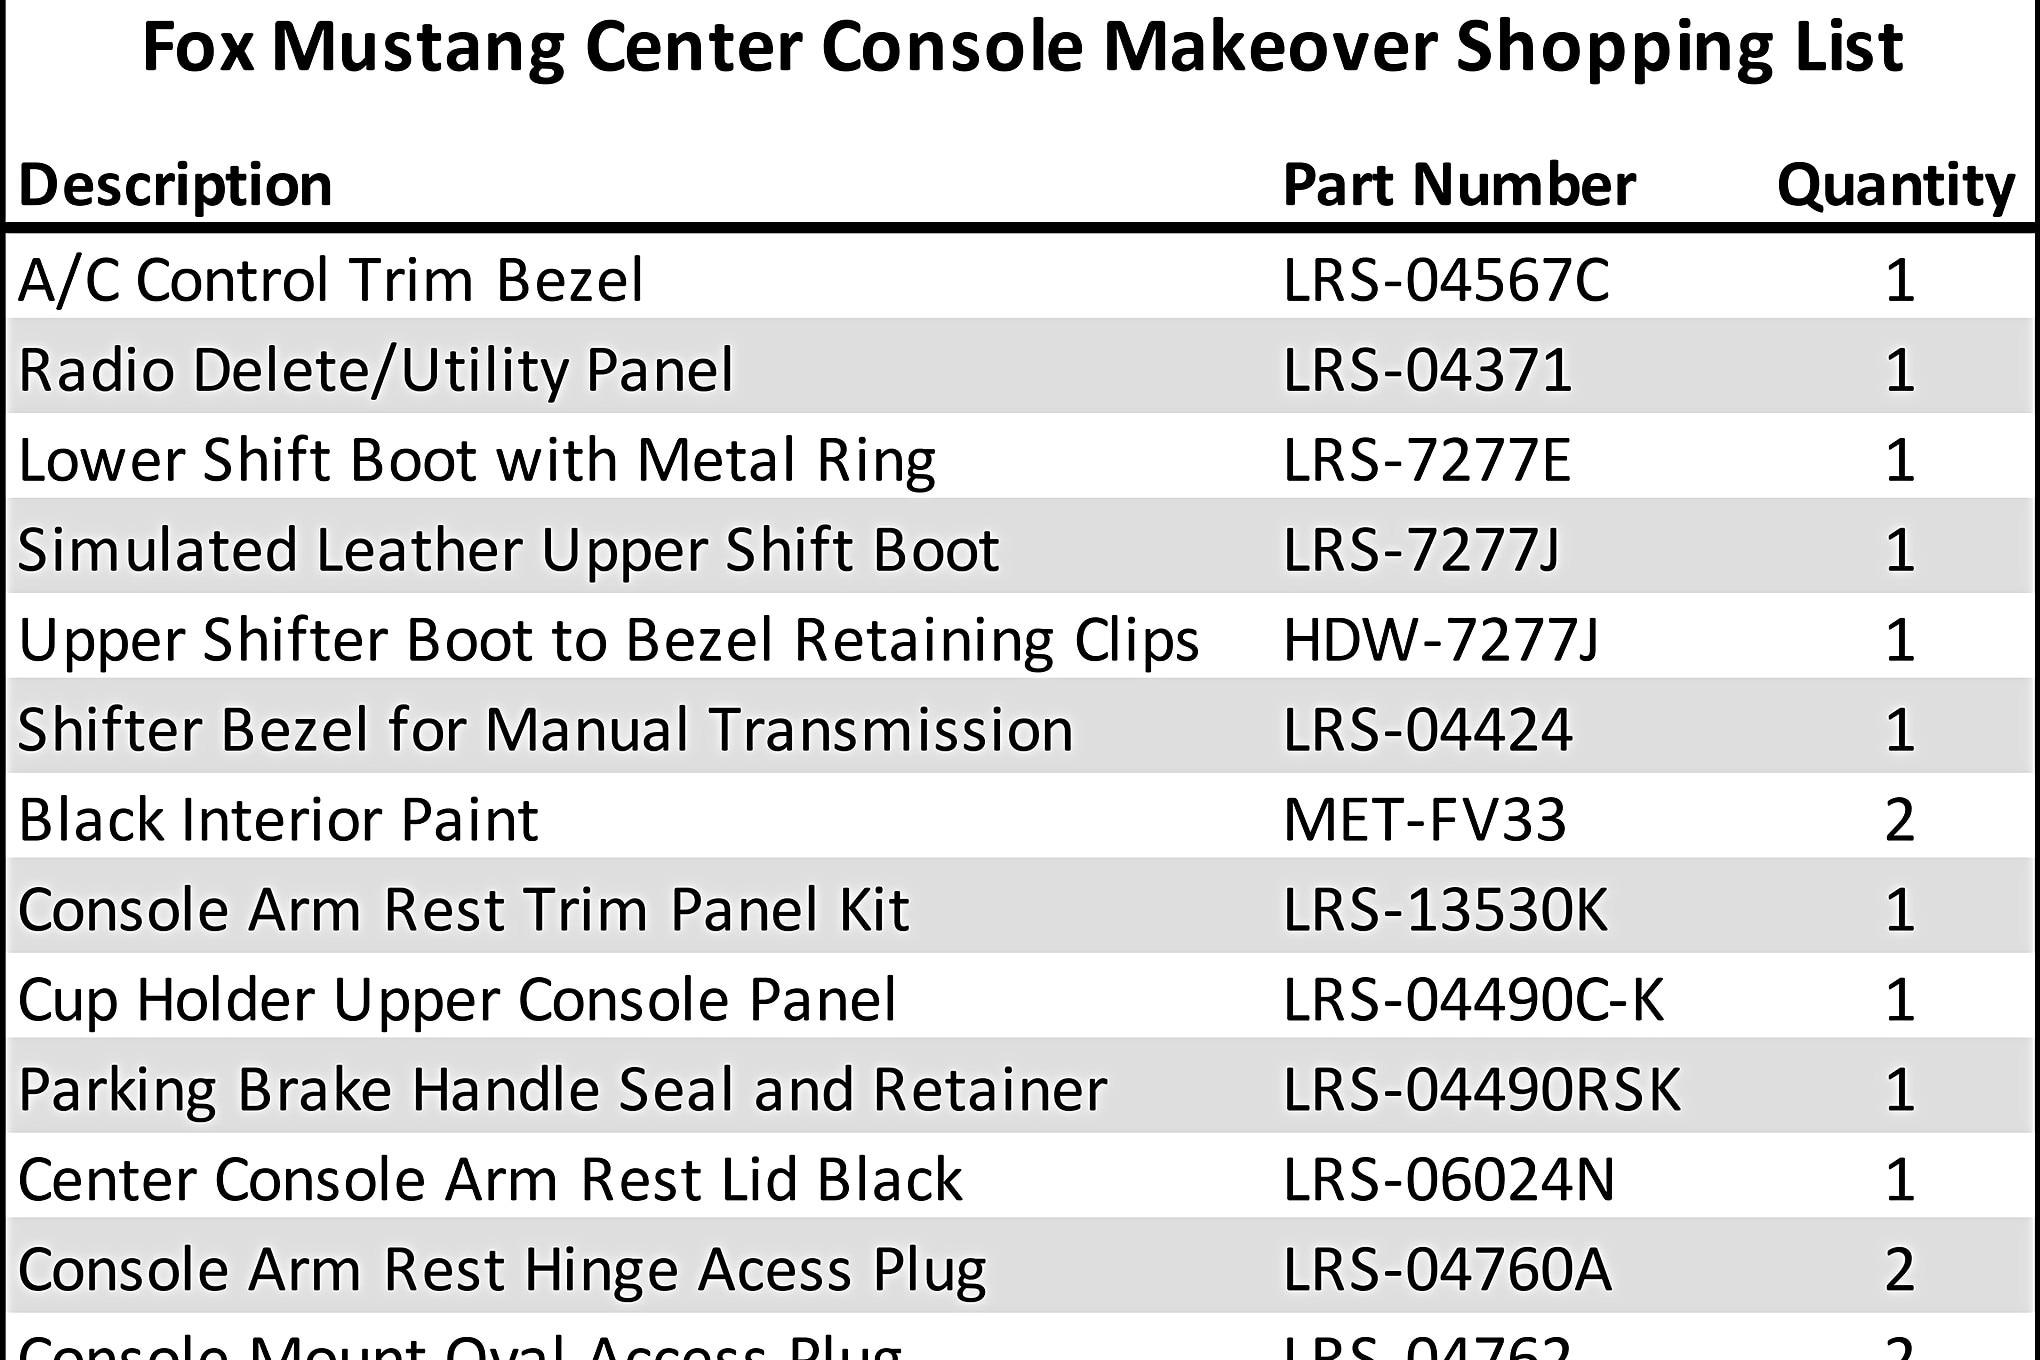 002 Mustang Center Console Shopping List